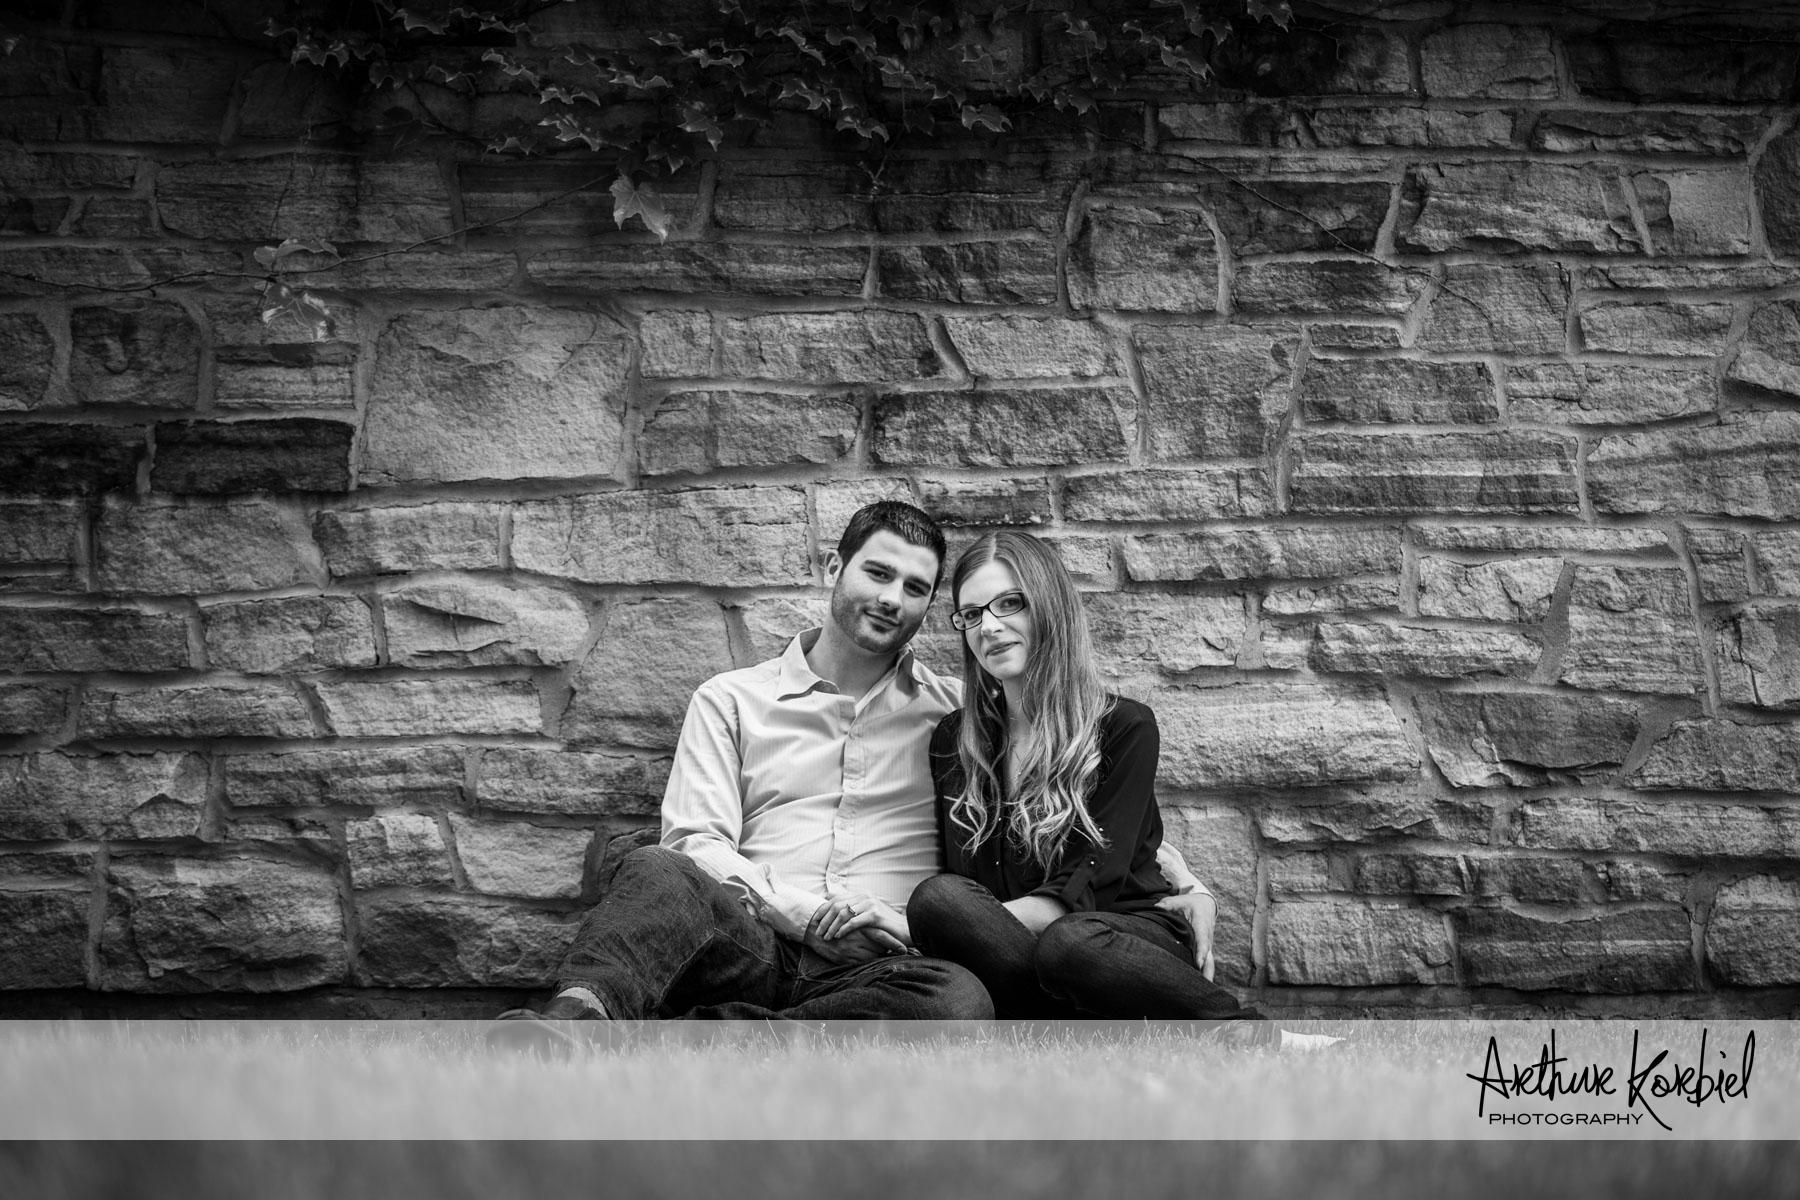 Arthur Korbiel Photography - London Engagement Photographer-026.jpg